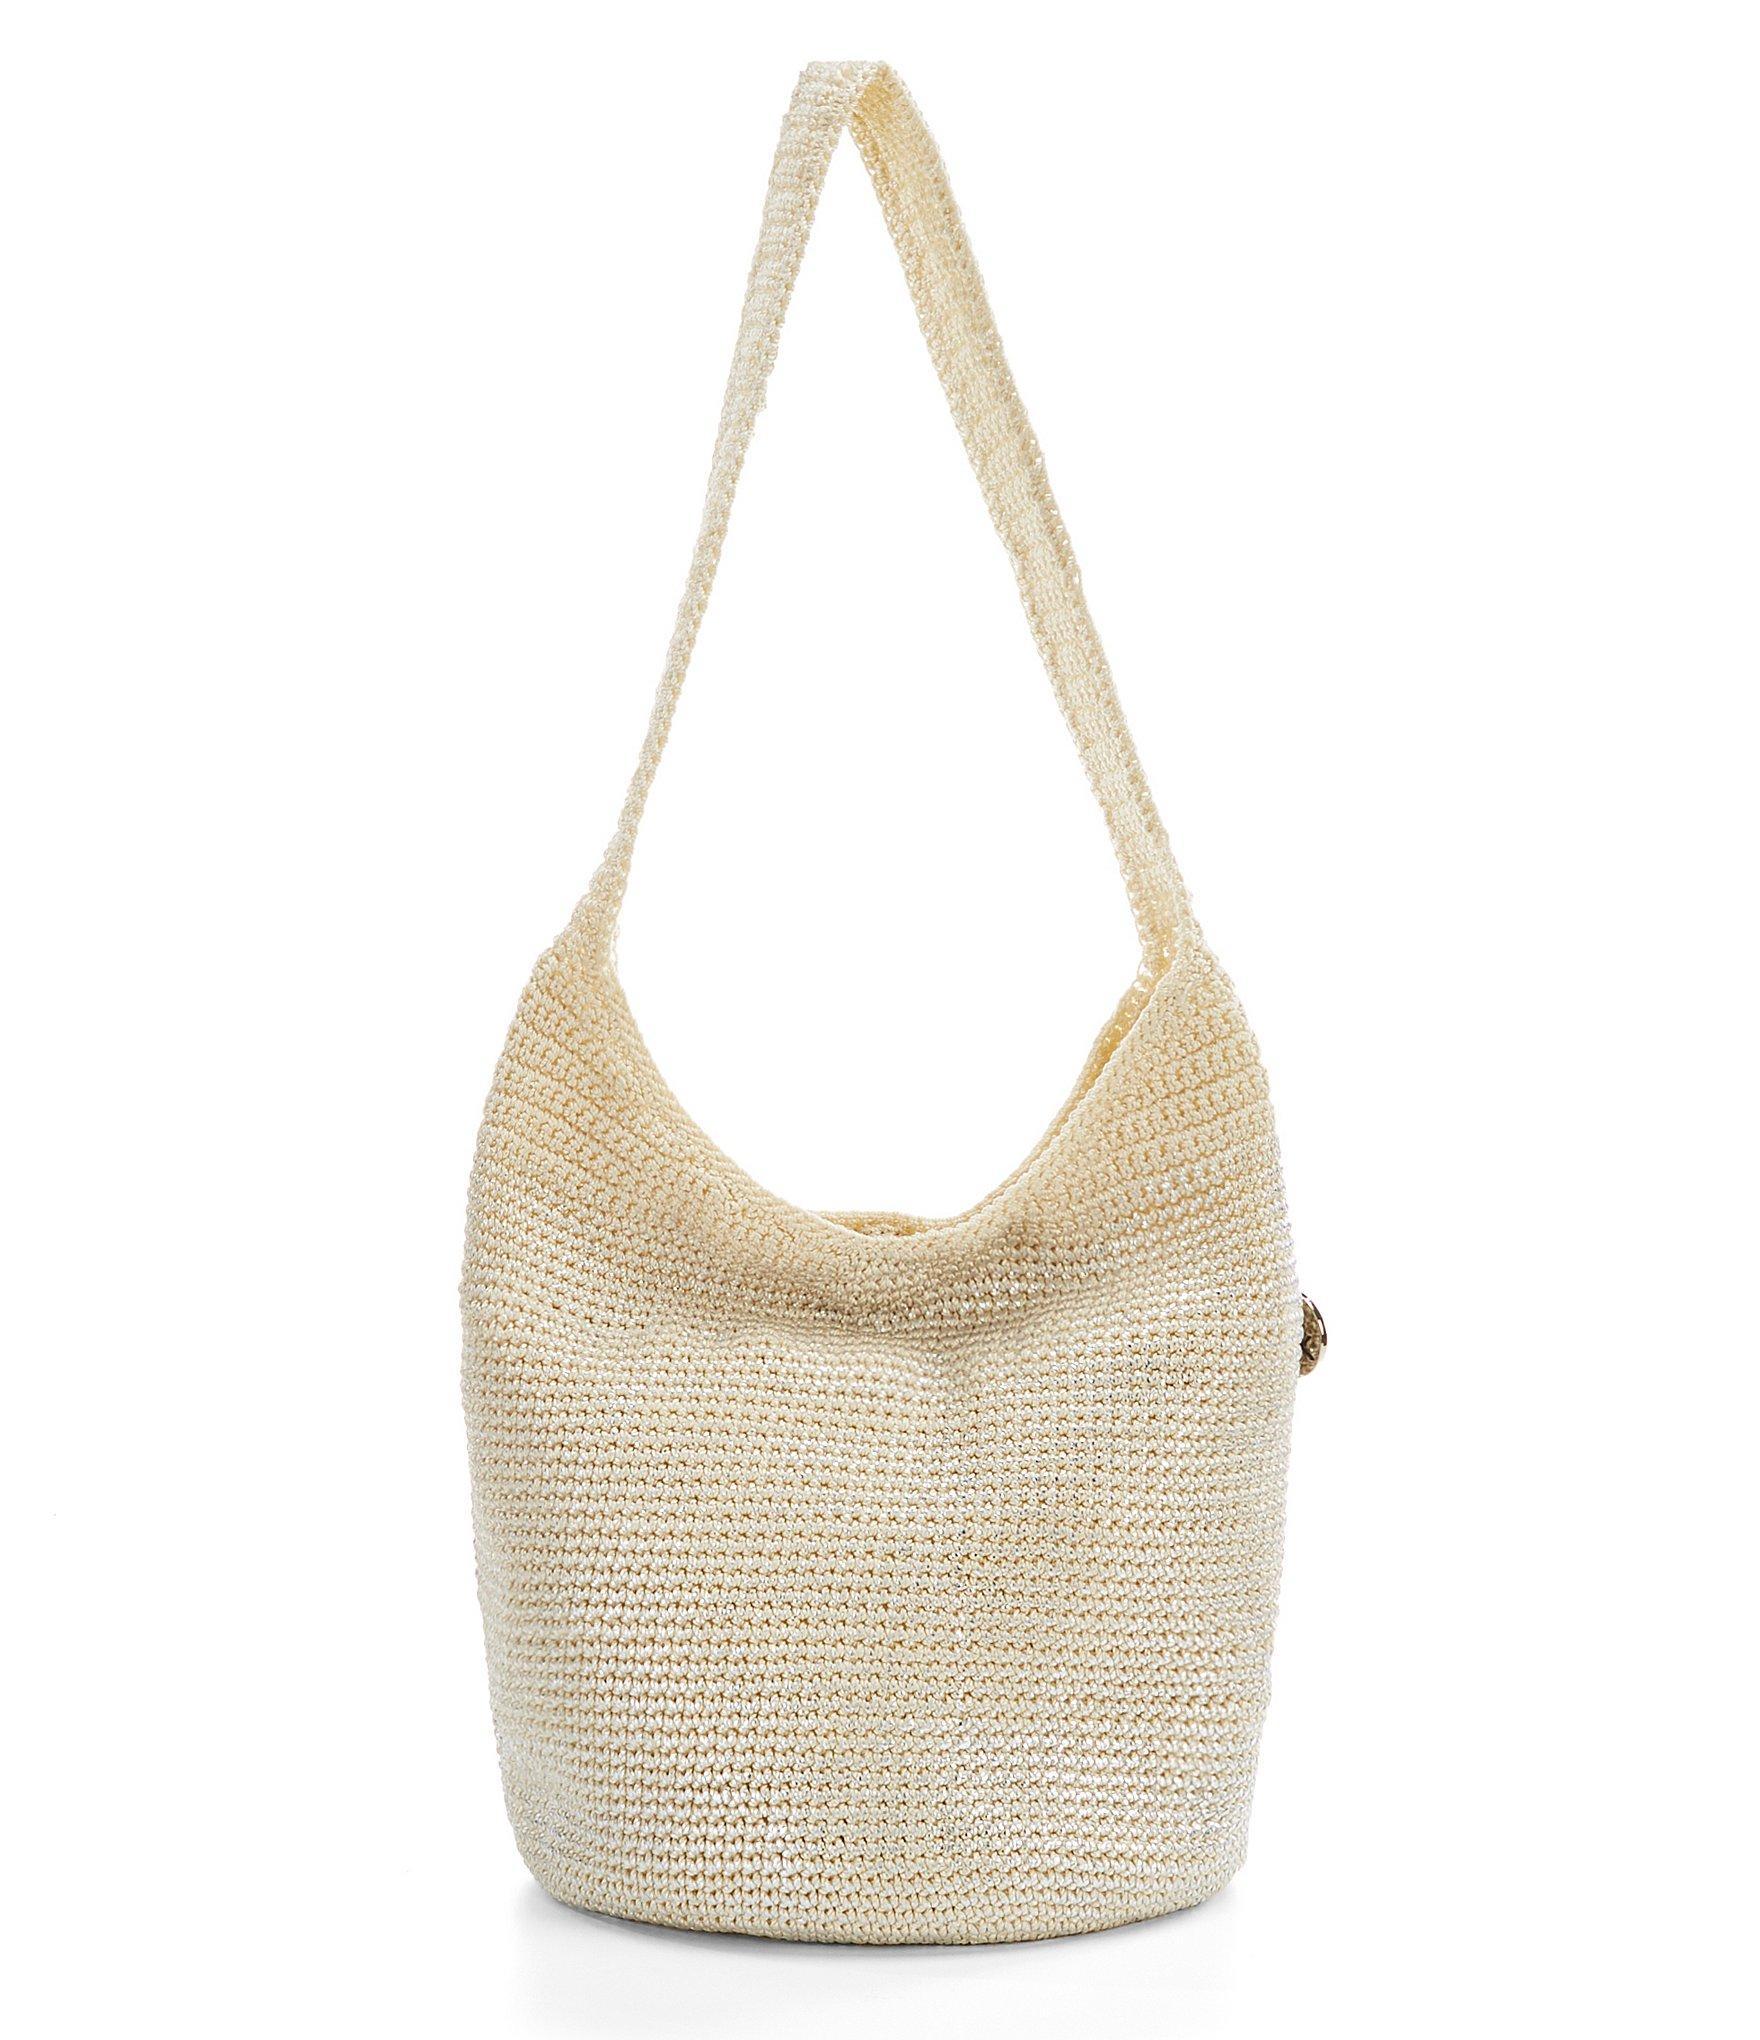 The Sak Palm Springs Metallic Crochet Hobo Bag In Metallic